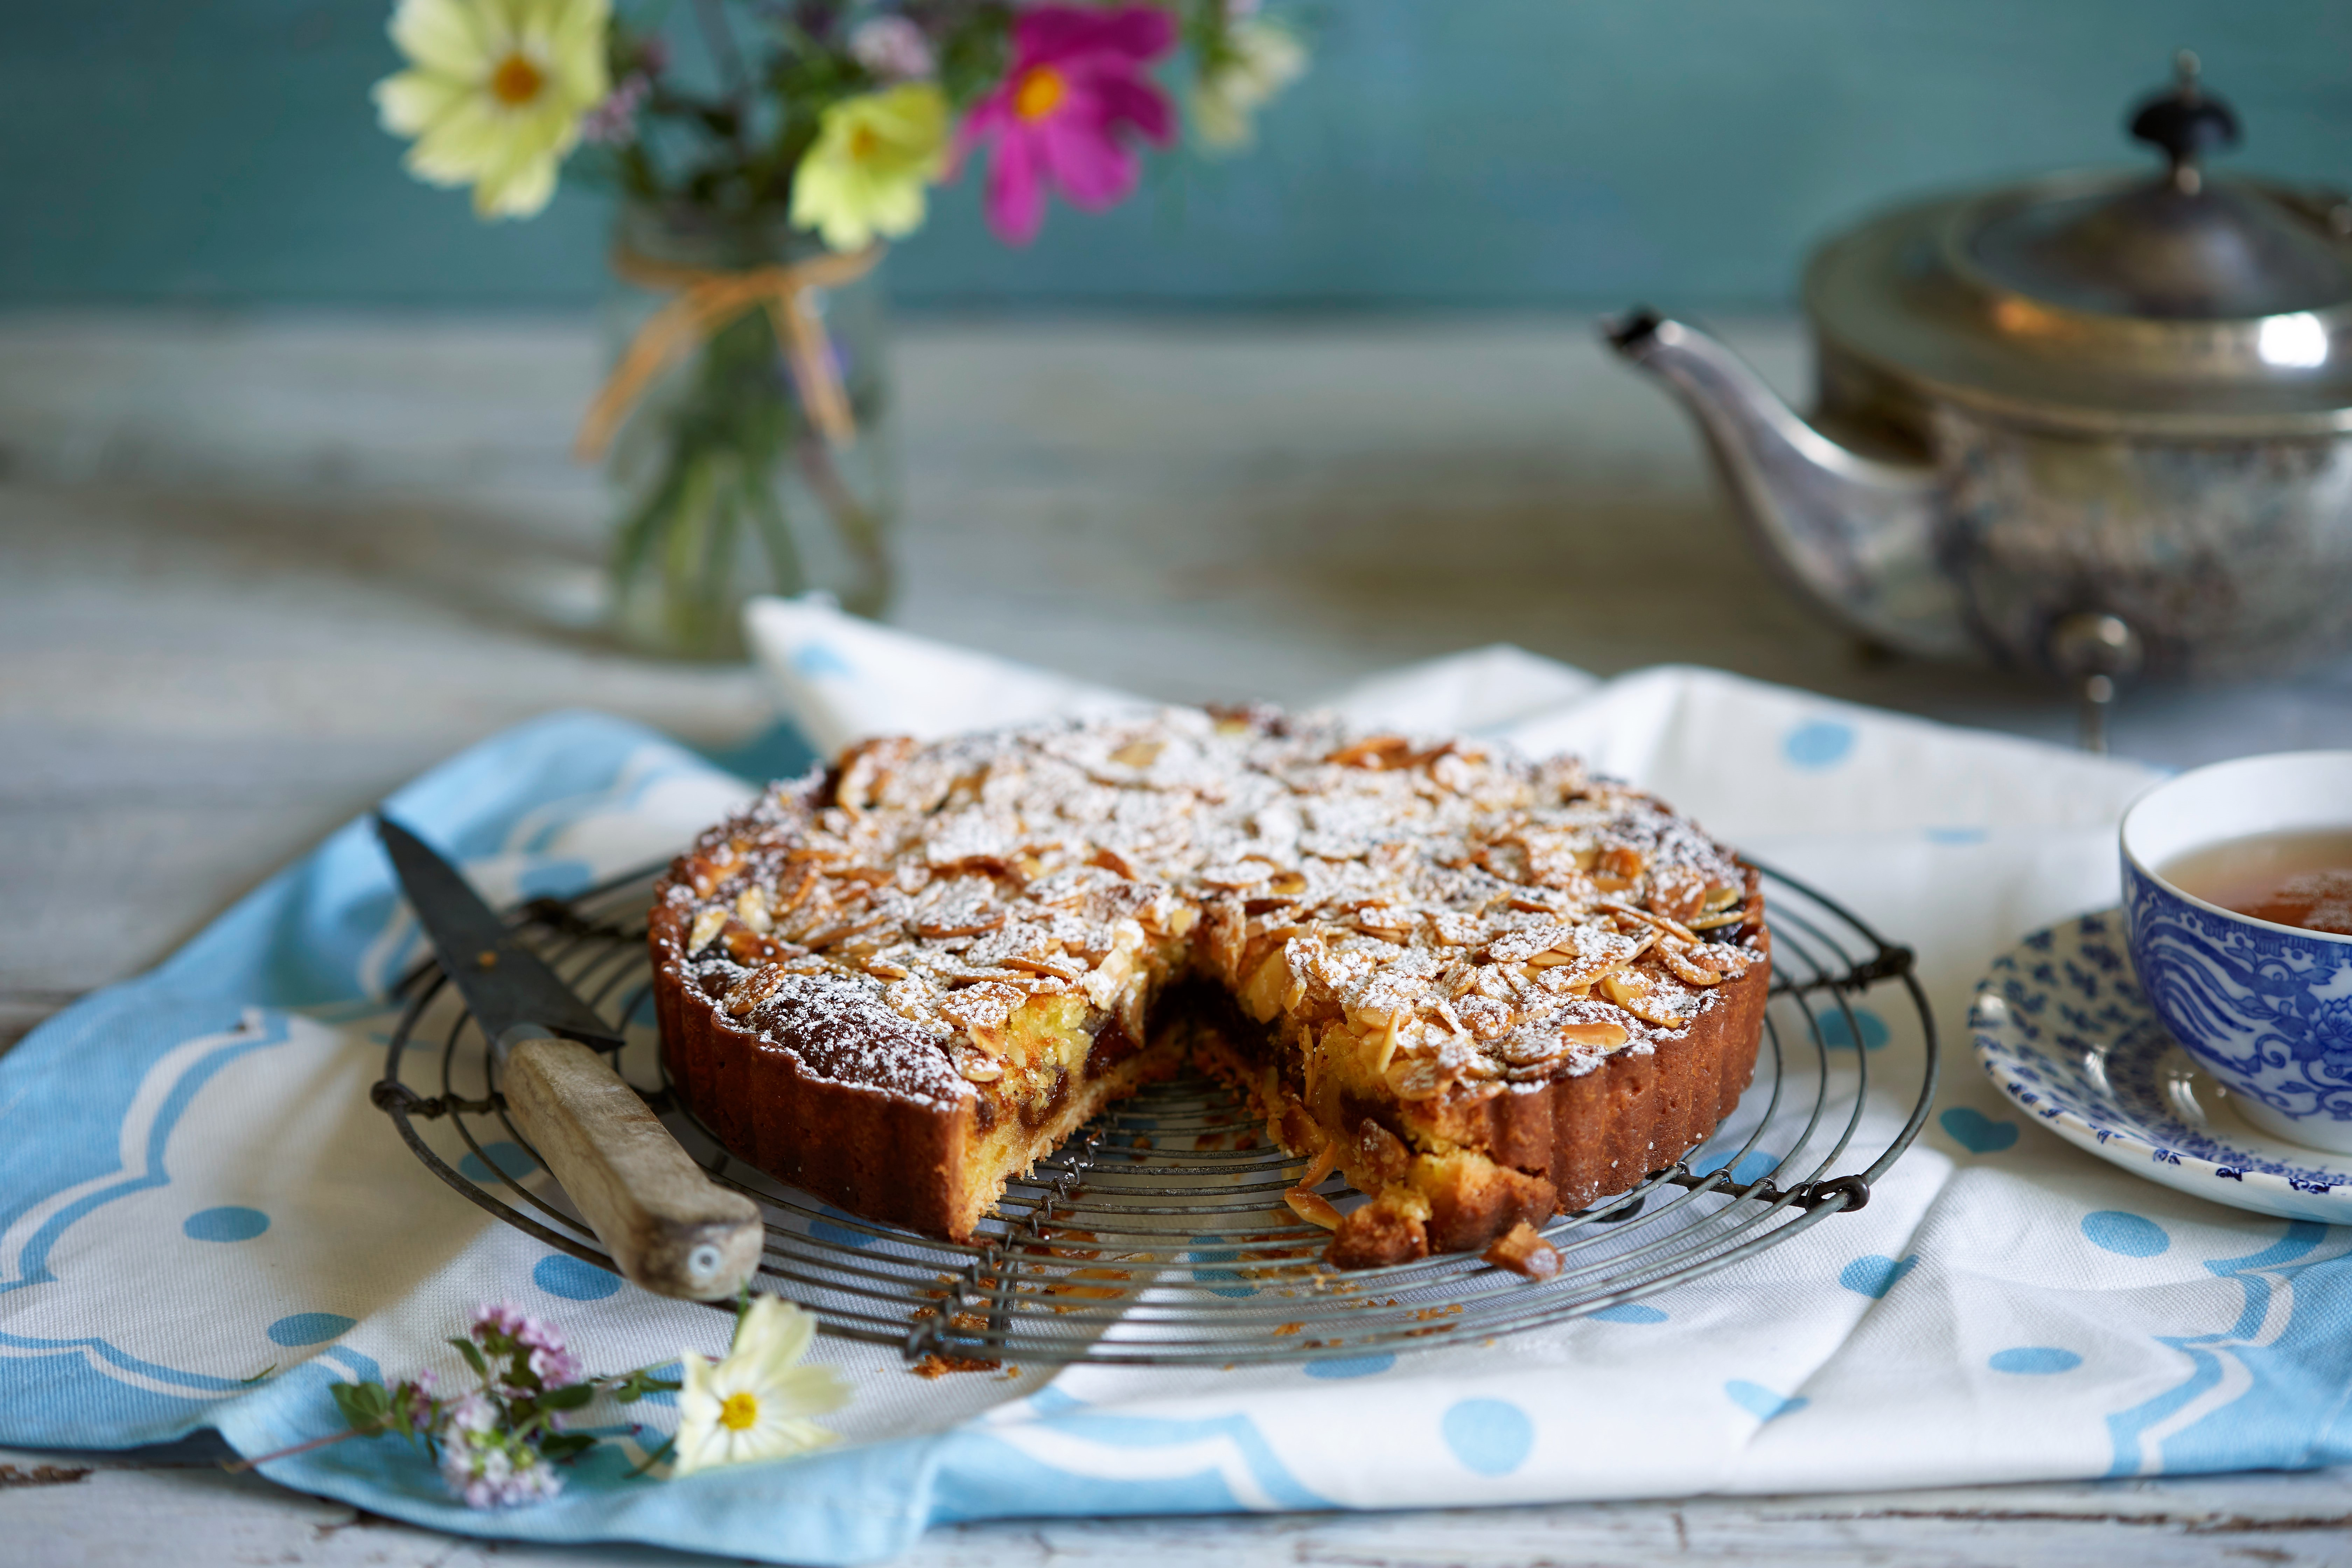 Prune and Almond Tart